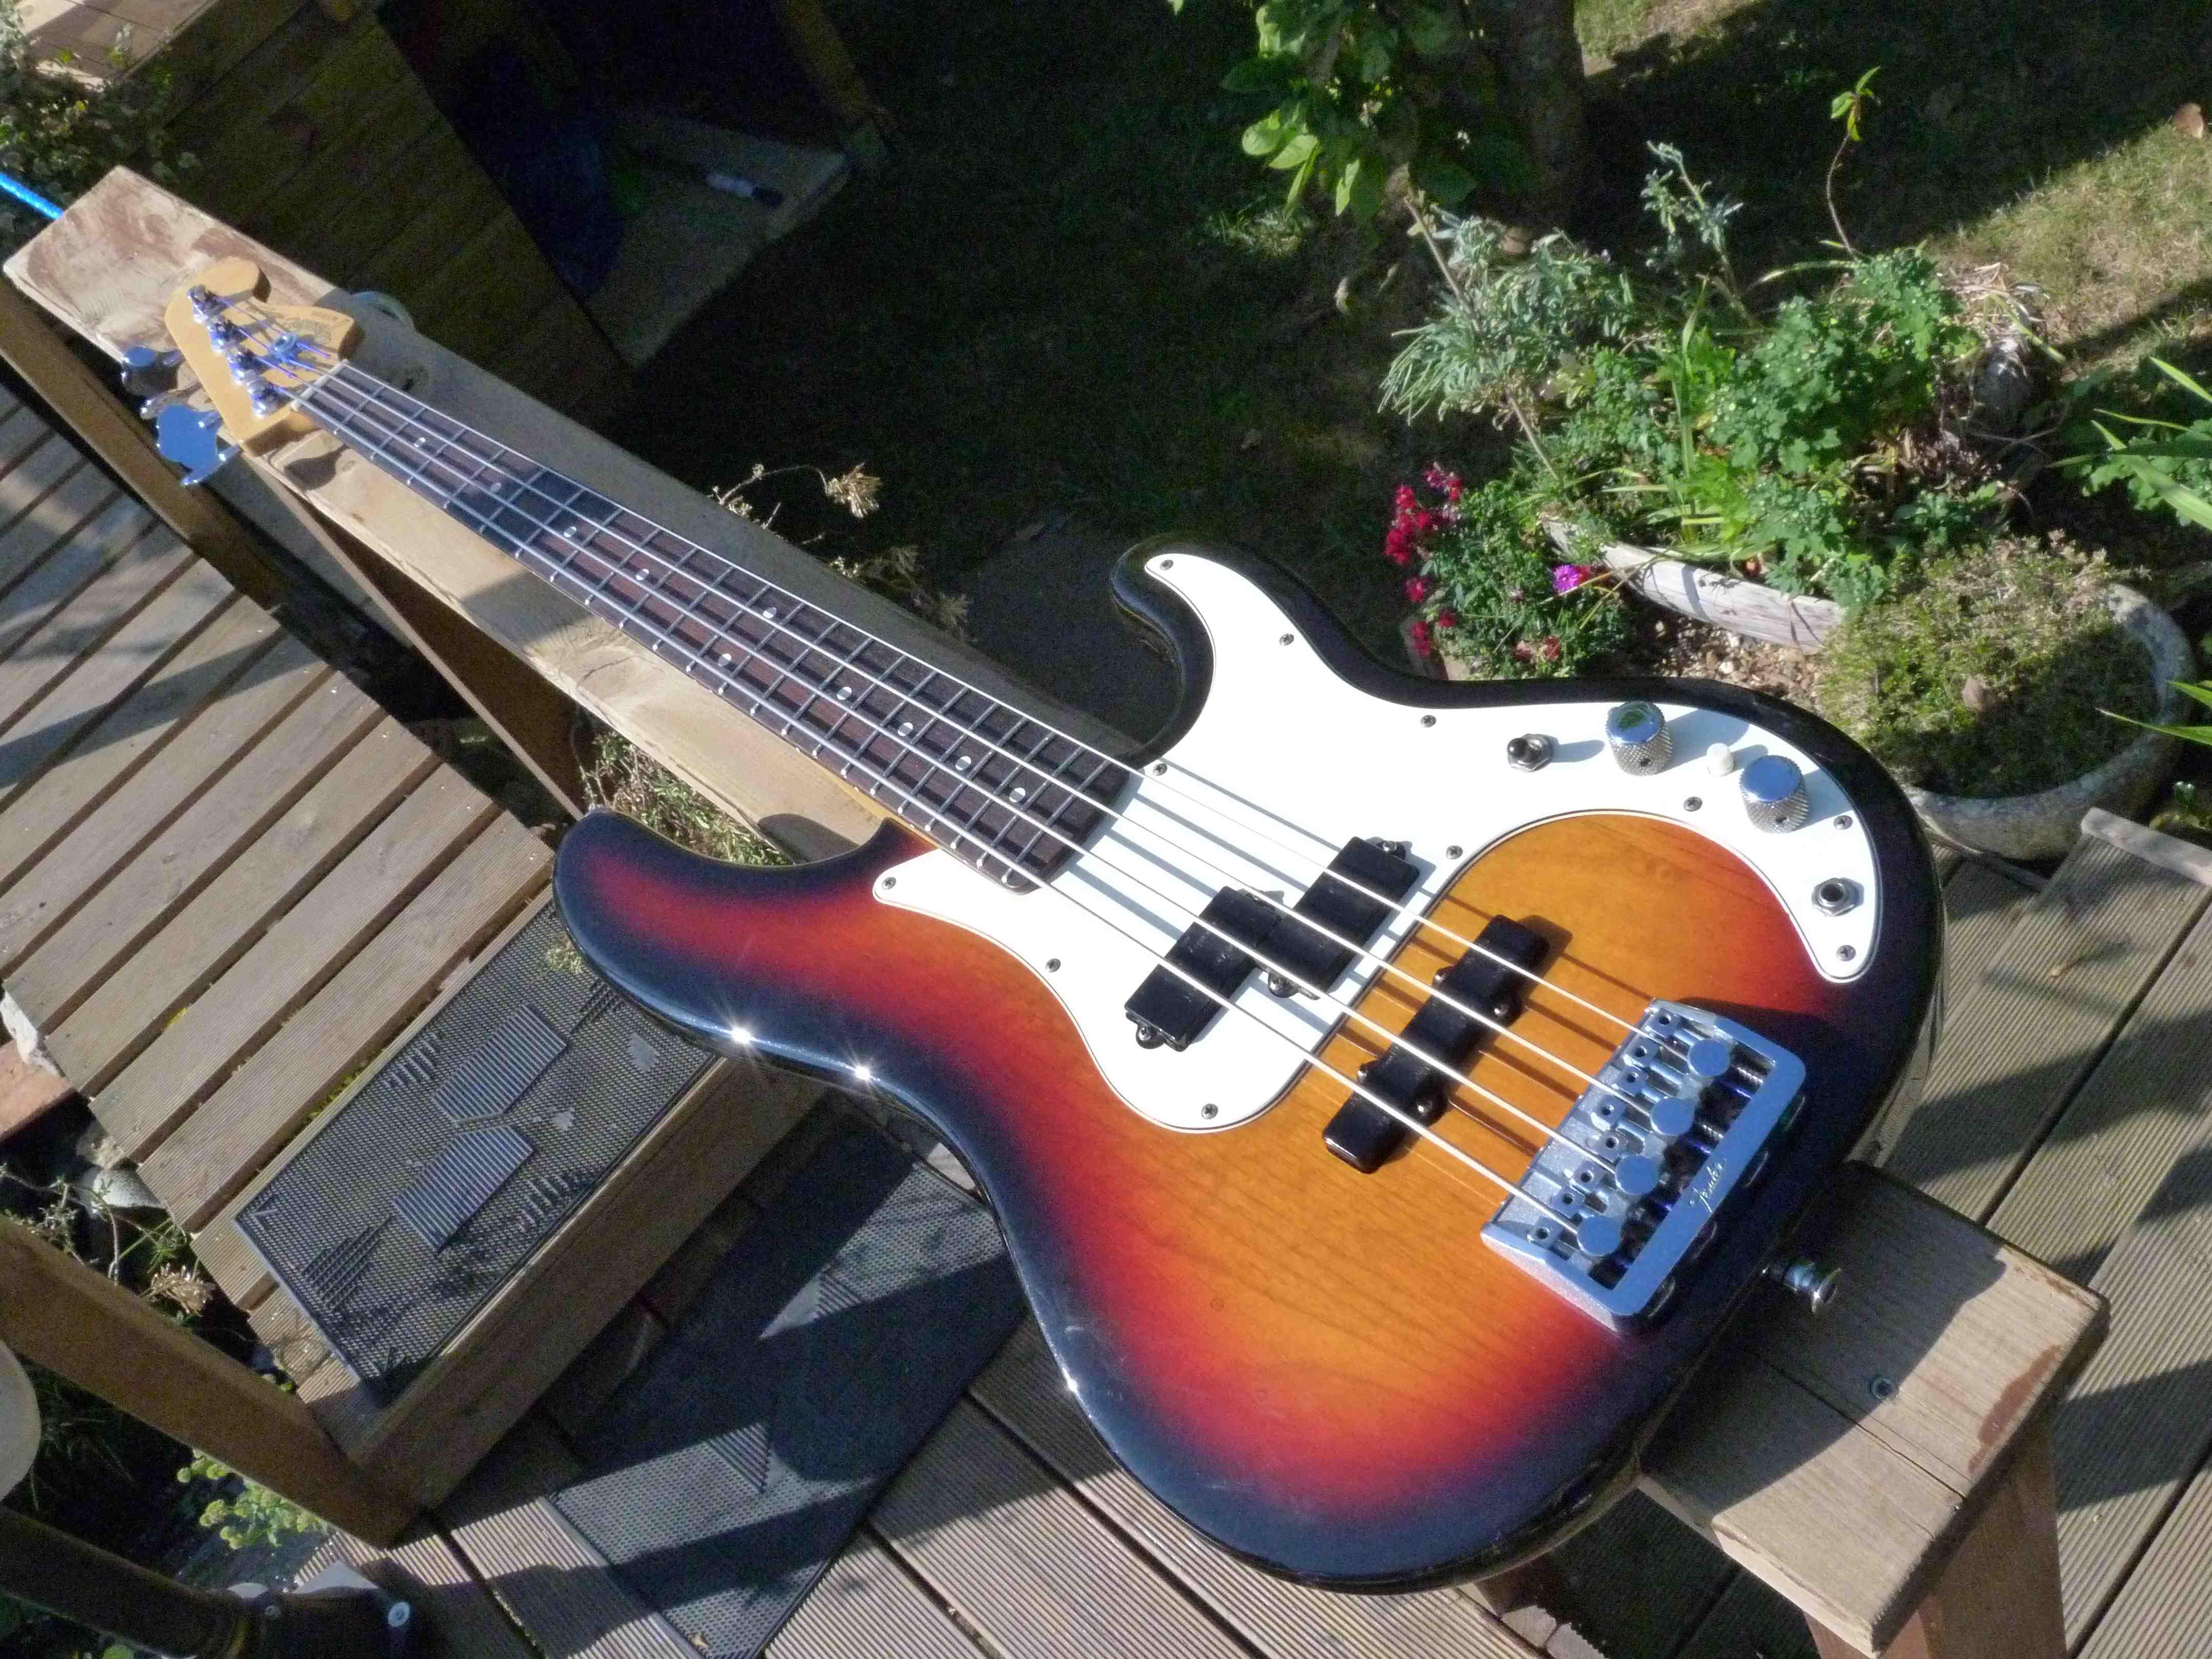 Precision Bass Special Fender-precision-bass-plus-deluxe-1992-1994-287859